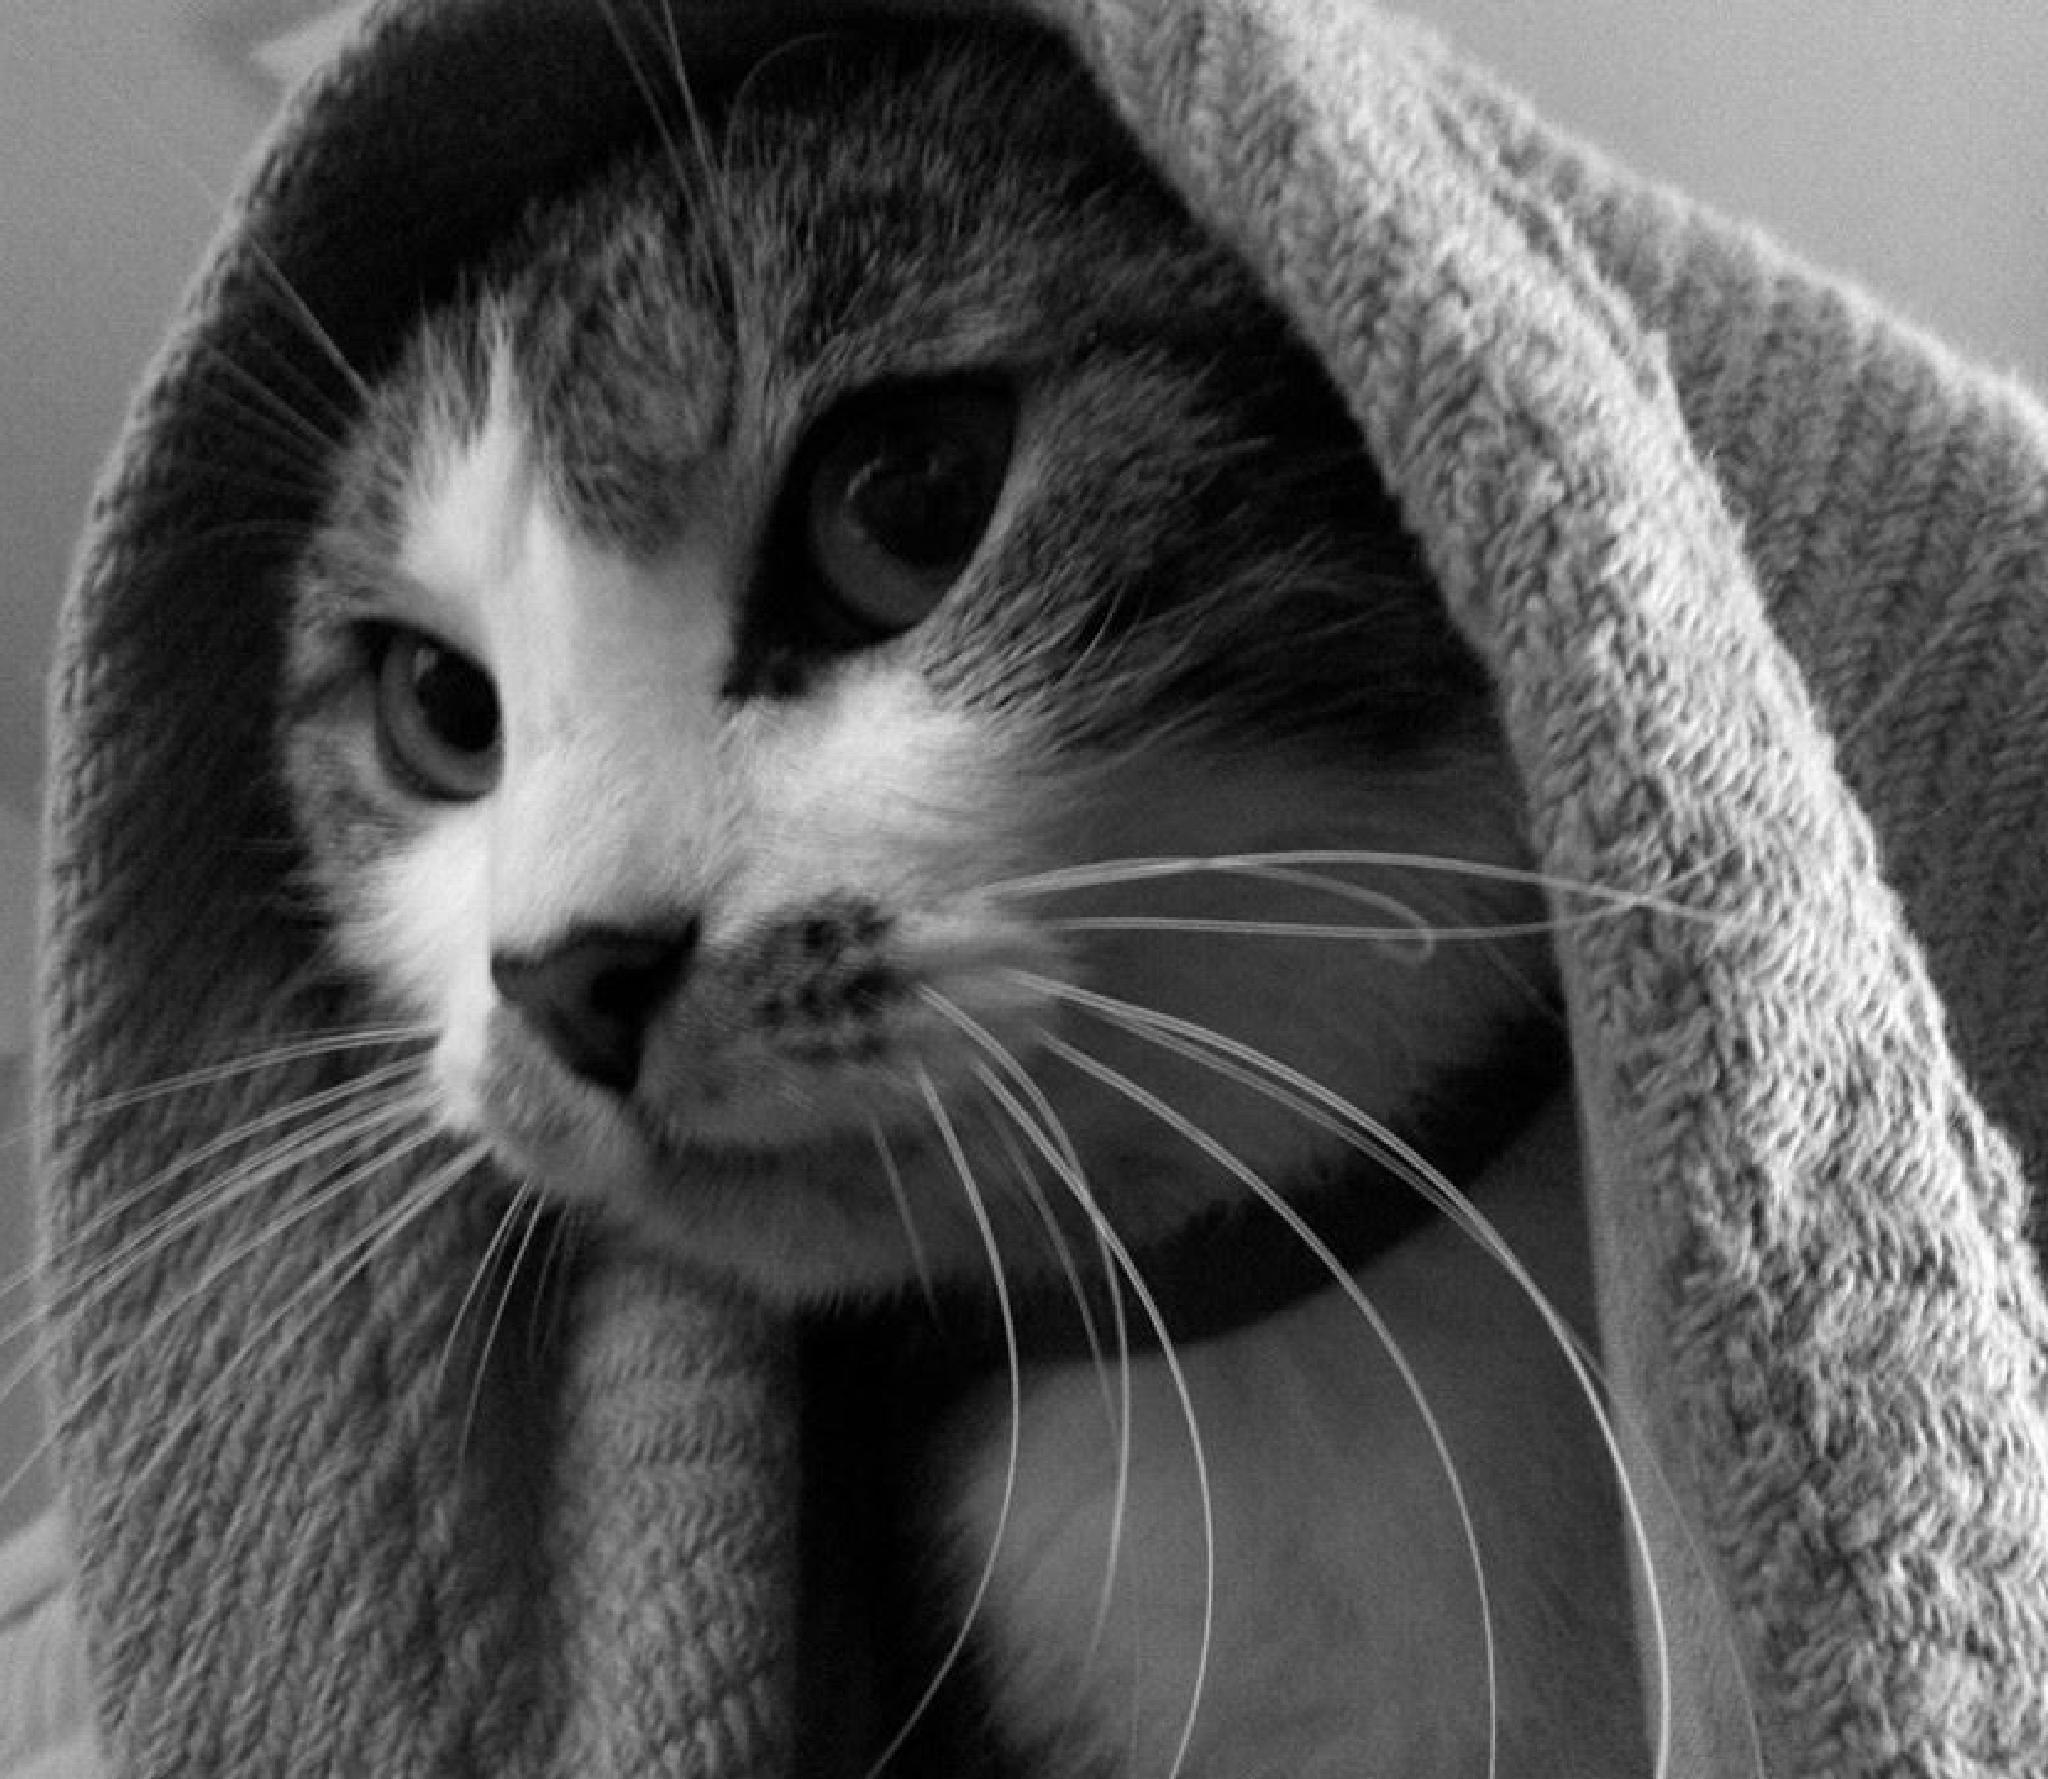 Merry Merri Under The Blanket by Lucy Jones Photography